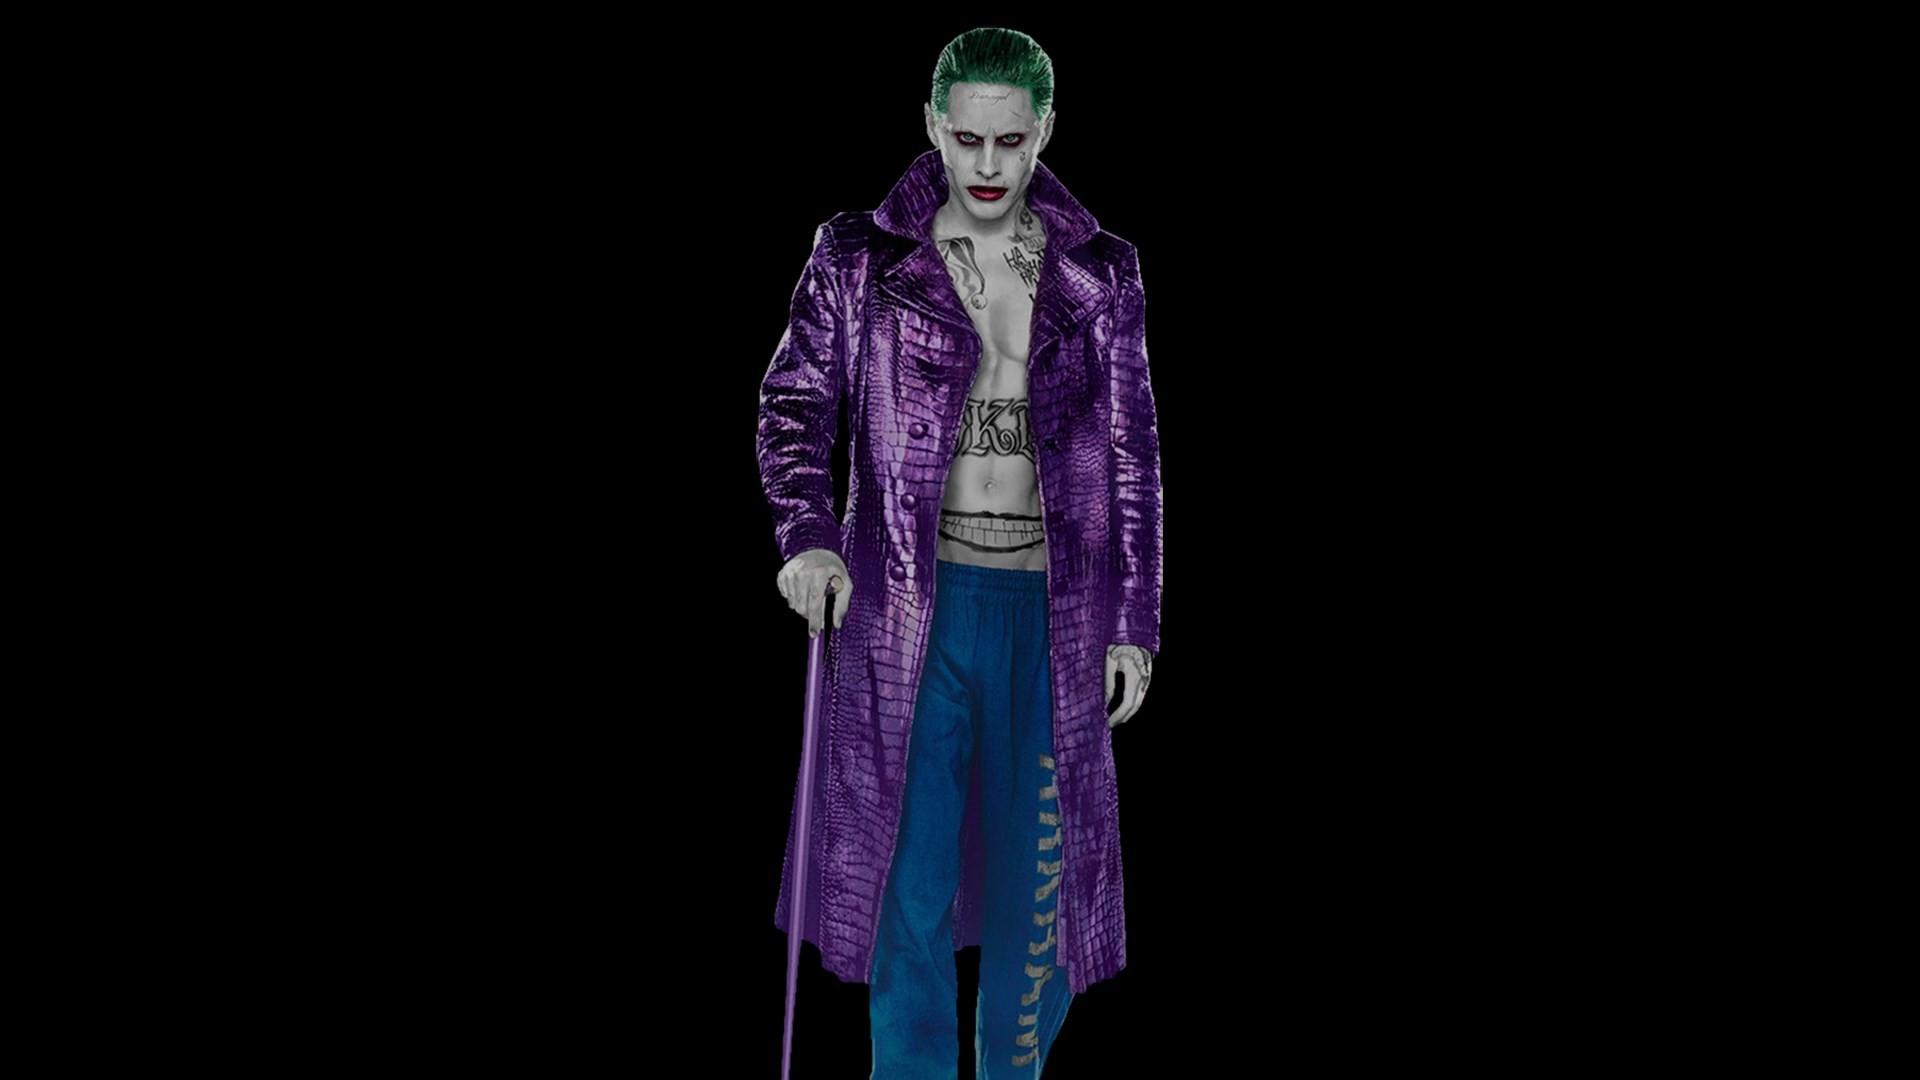 Suicide Squad Joker Wallpaper (73+ images)